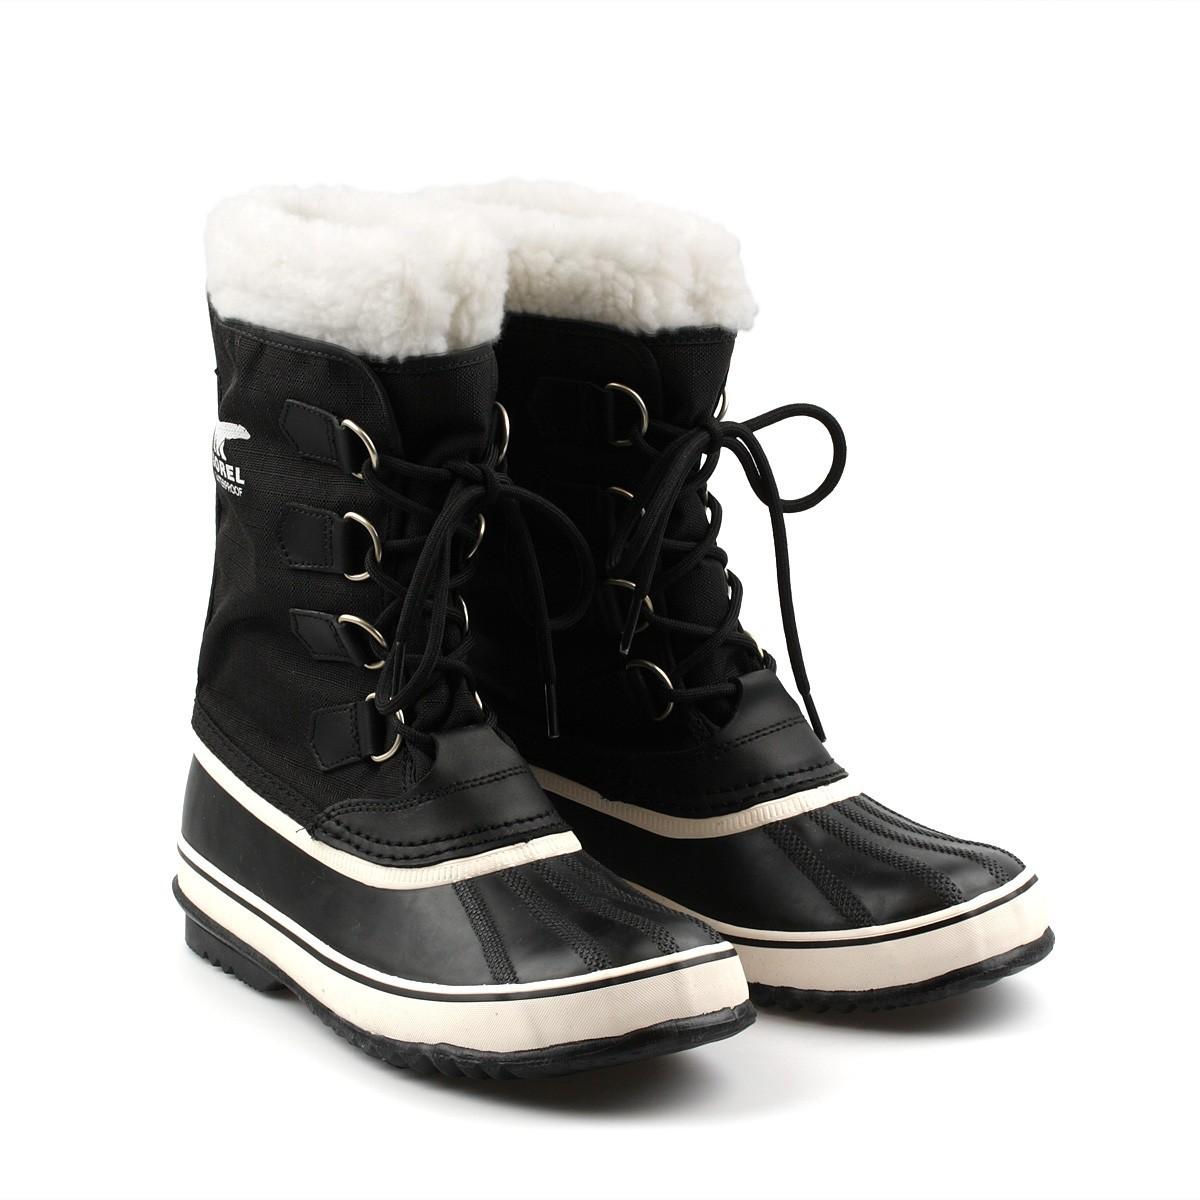 Black Sorel Mens Snow Boots Collection : Gorgeous Sorel Snow Boots ...